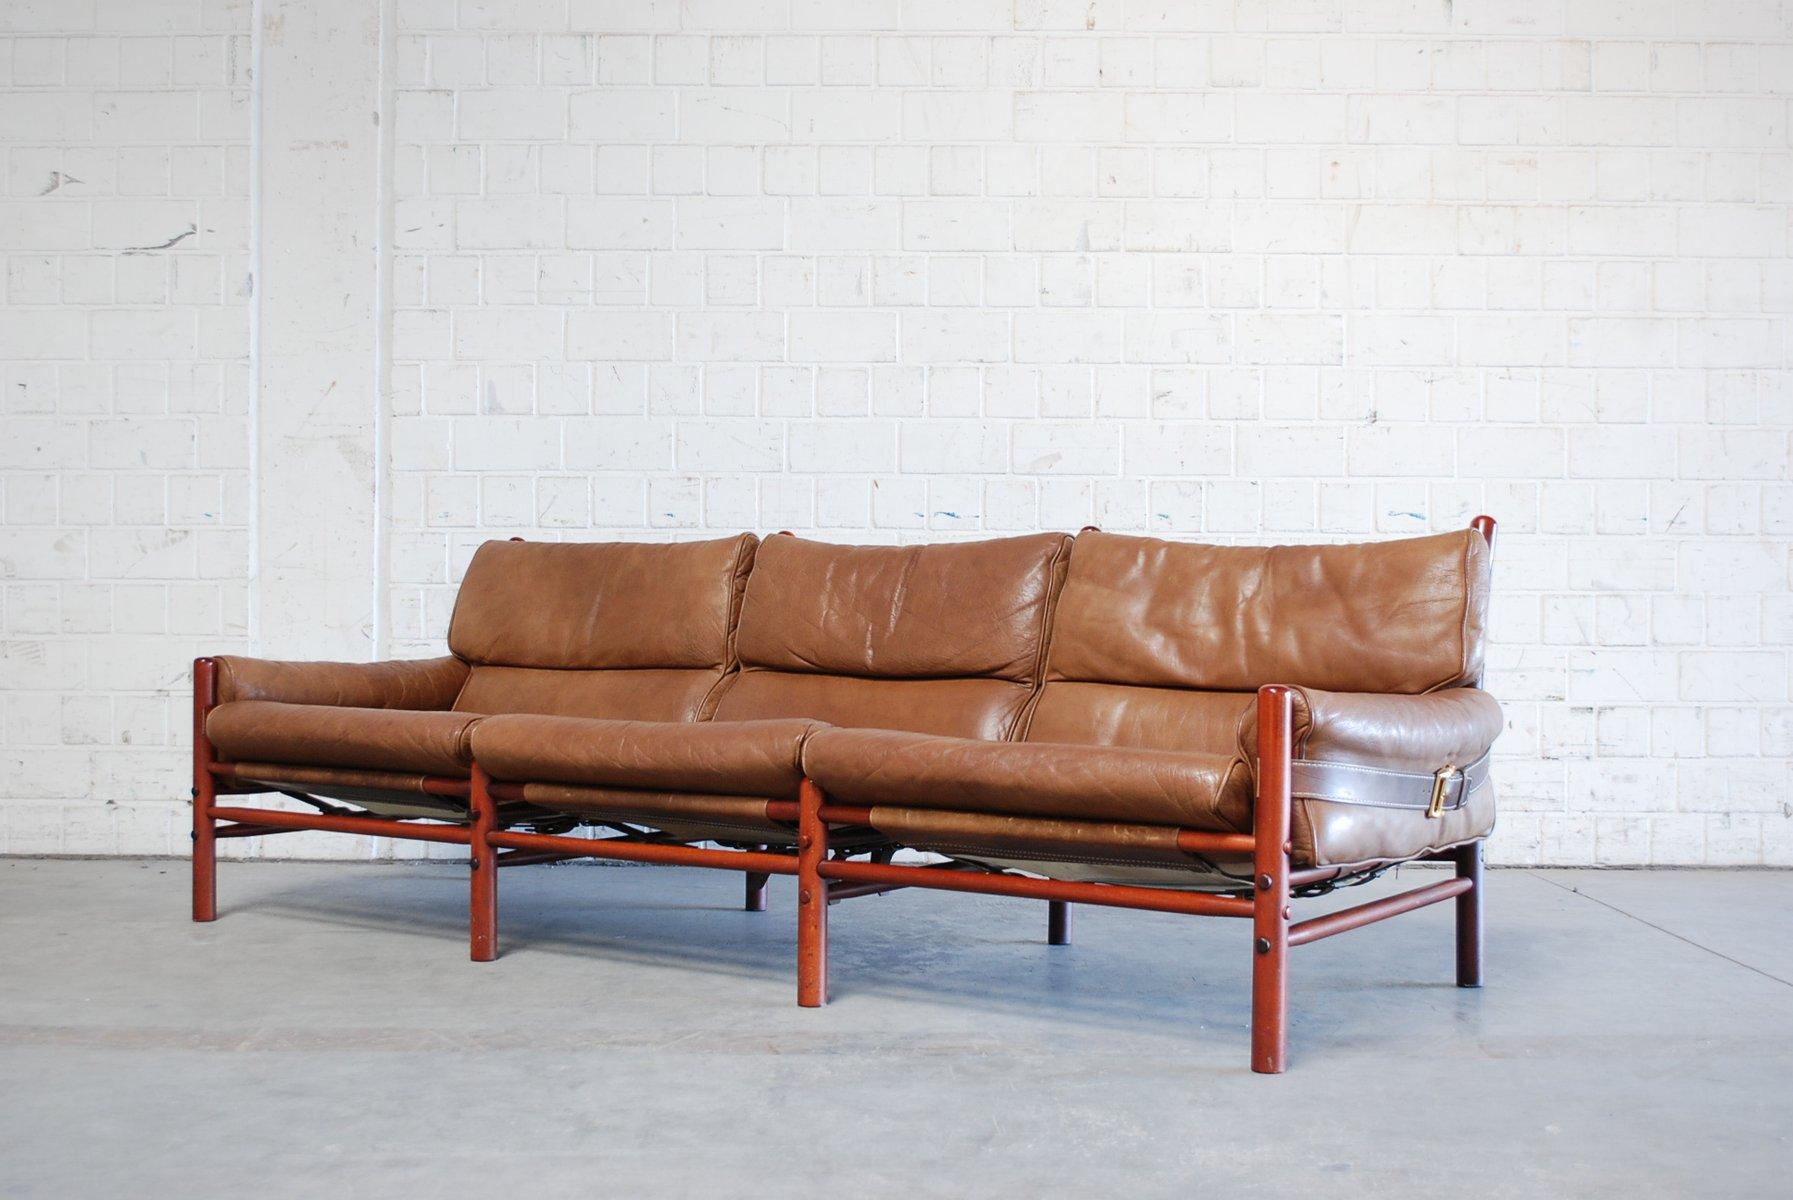 vintage kontiki 3 seater leather sofa by arne norell bei. Black Bedroom Furniture Sets. Home Design Ideas